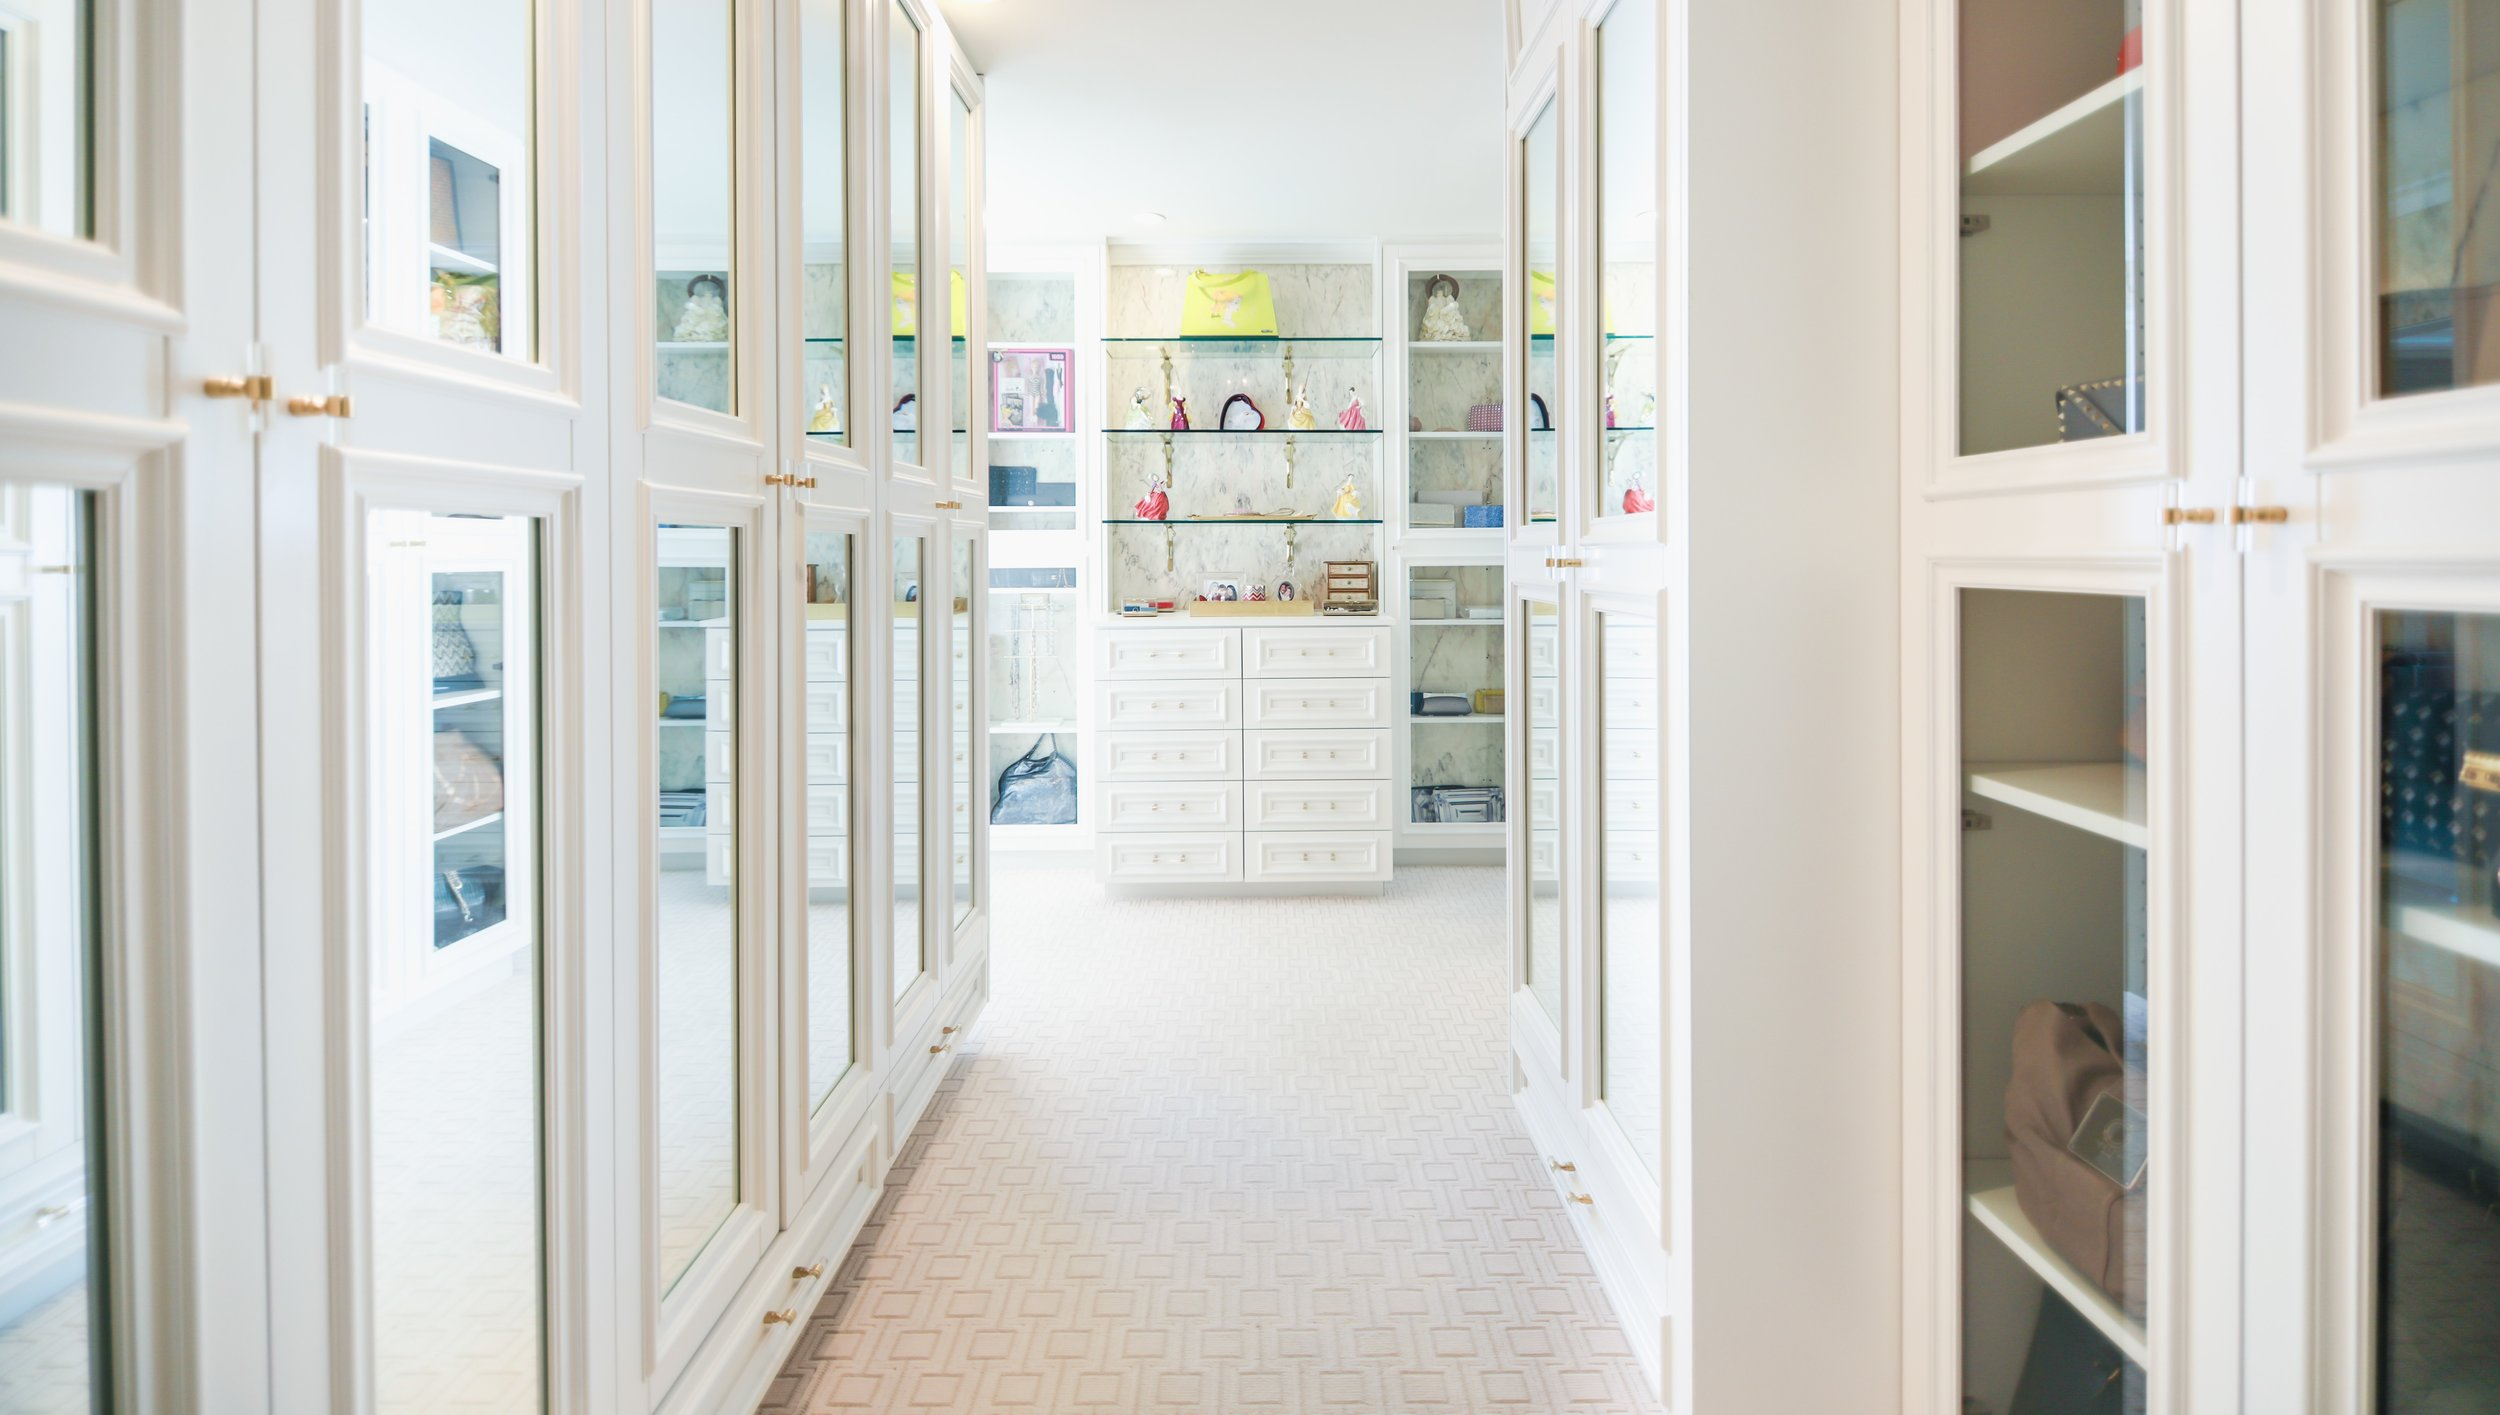 Joni closet cropped.jpg